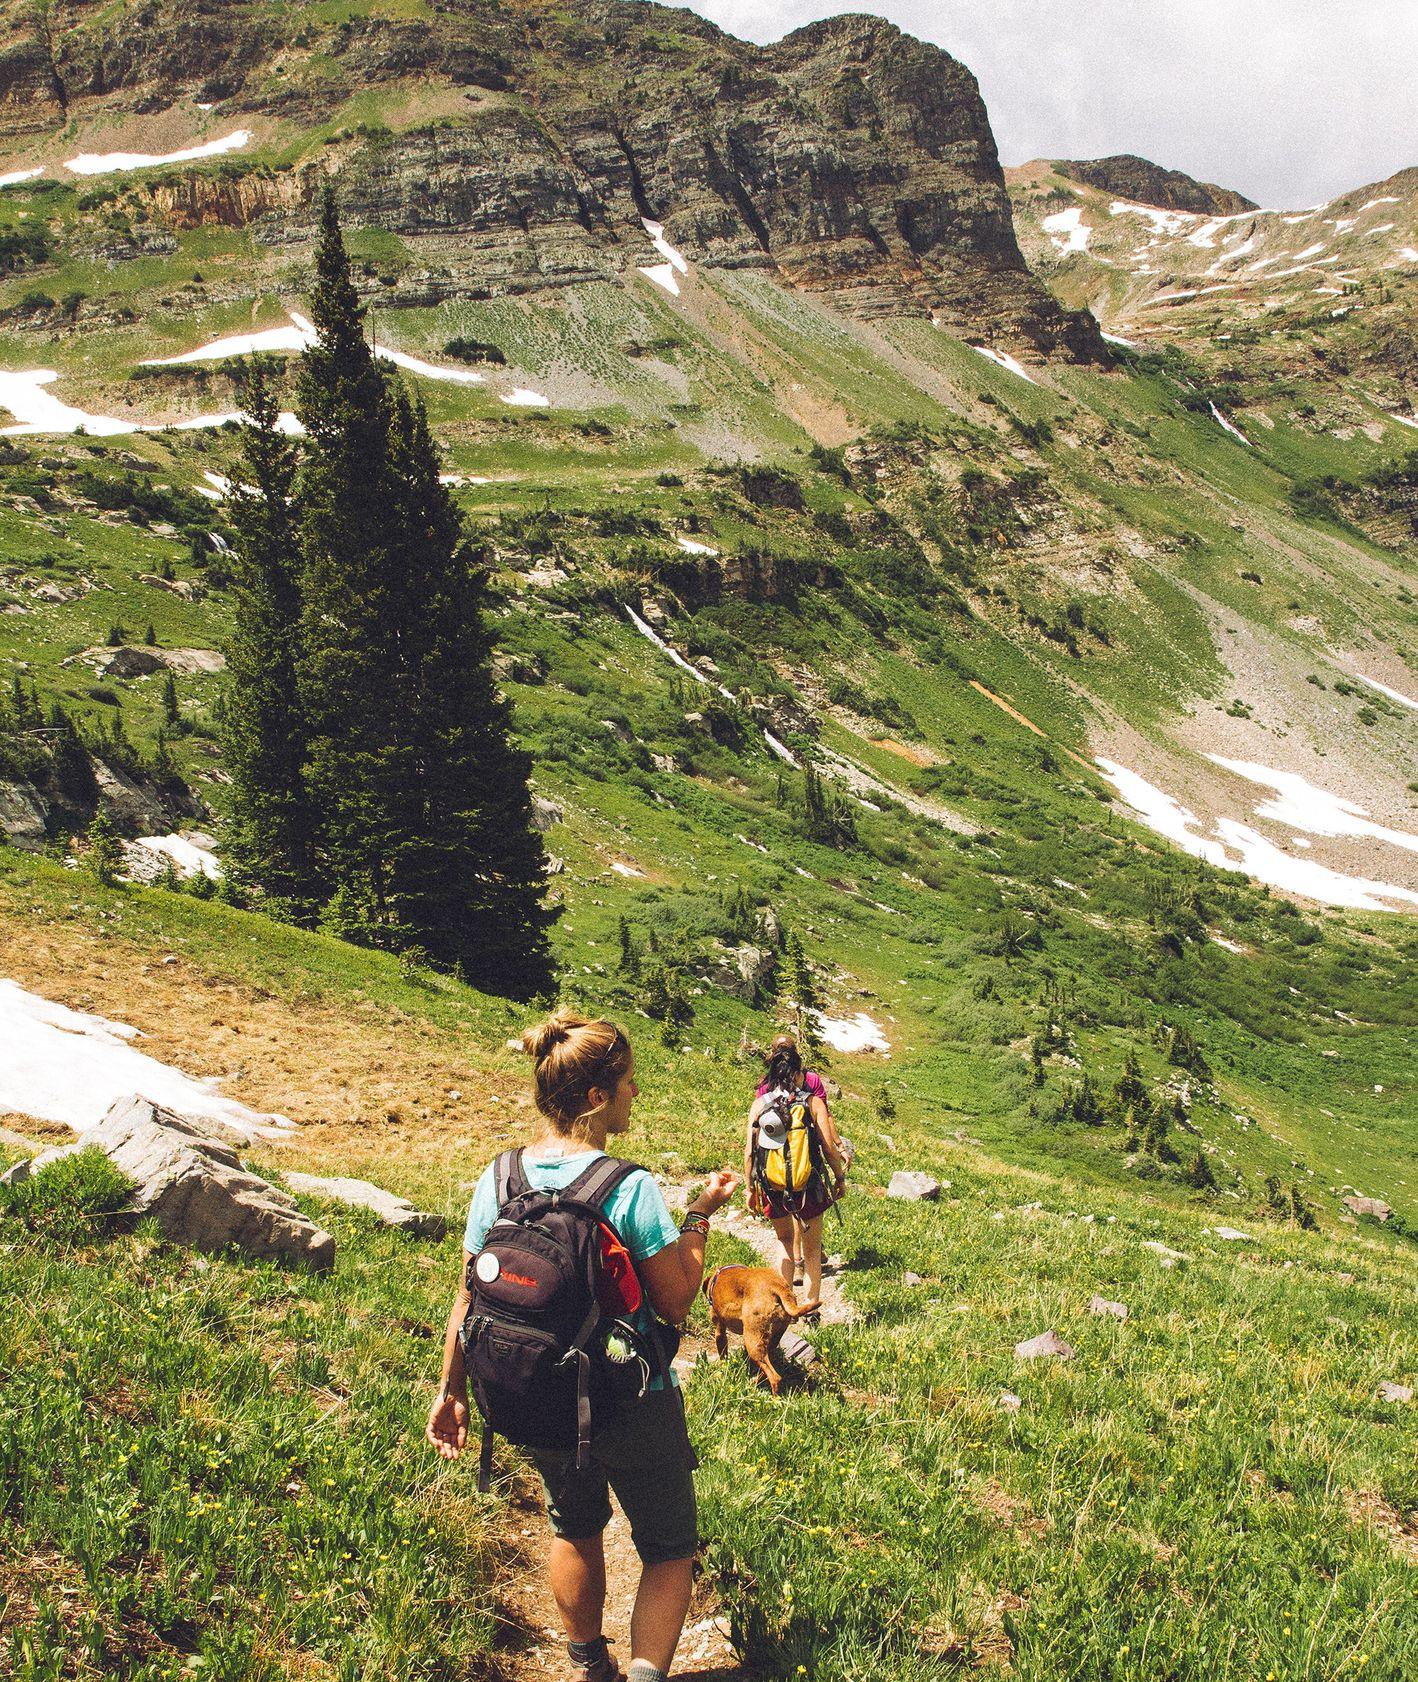 Spacer w górach. Backpacking (fot. Holly Mandarich / unsplash.com)